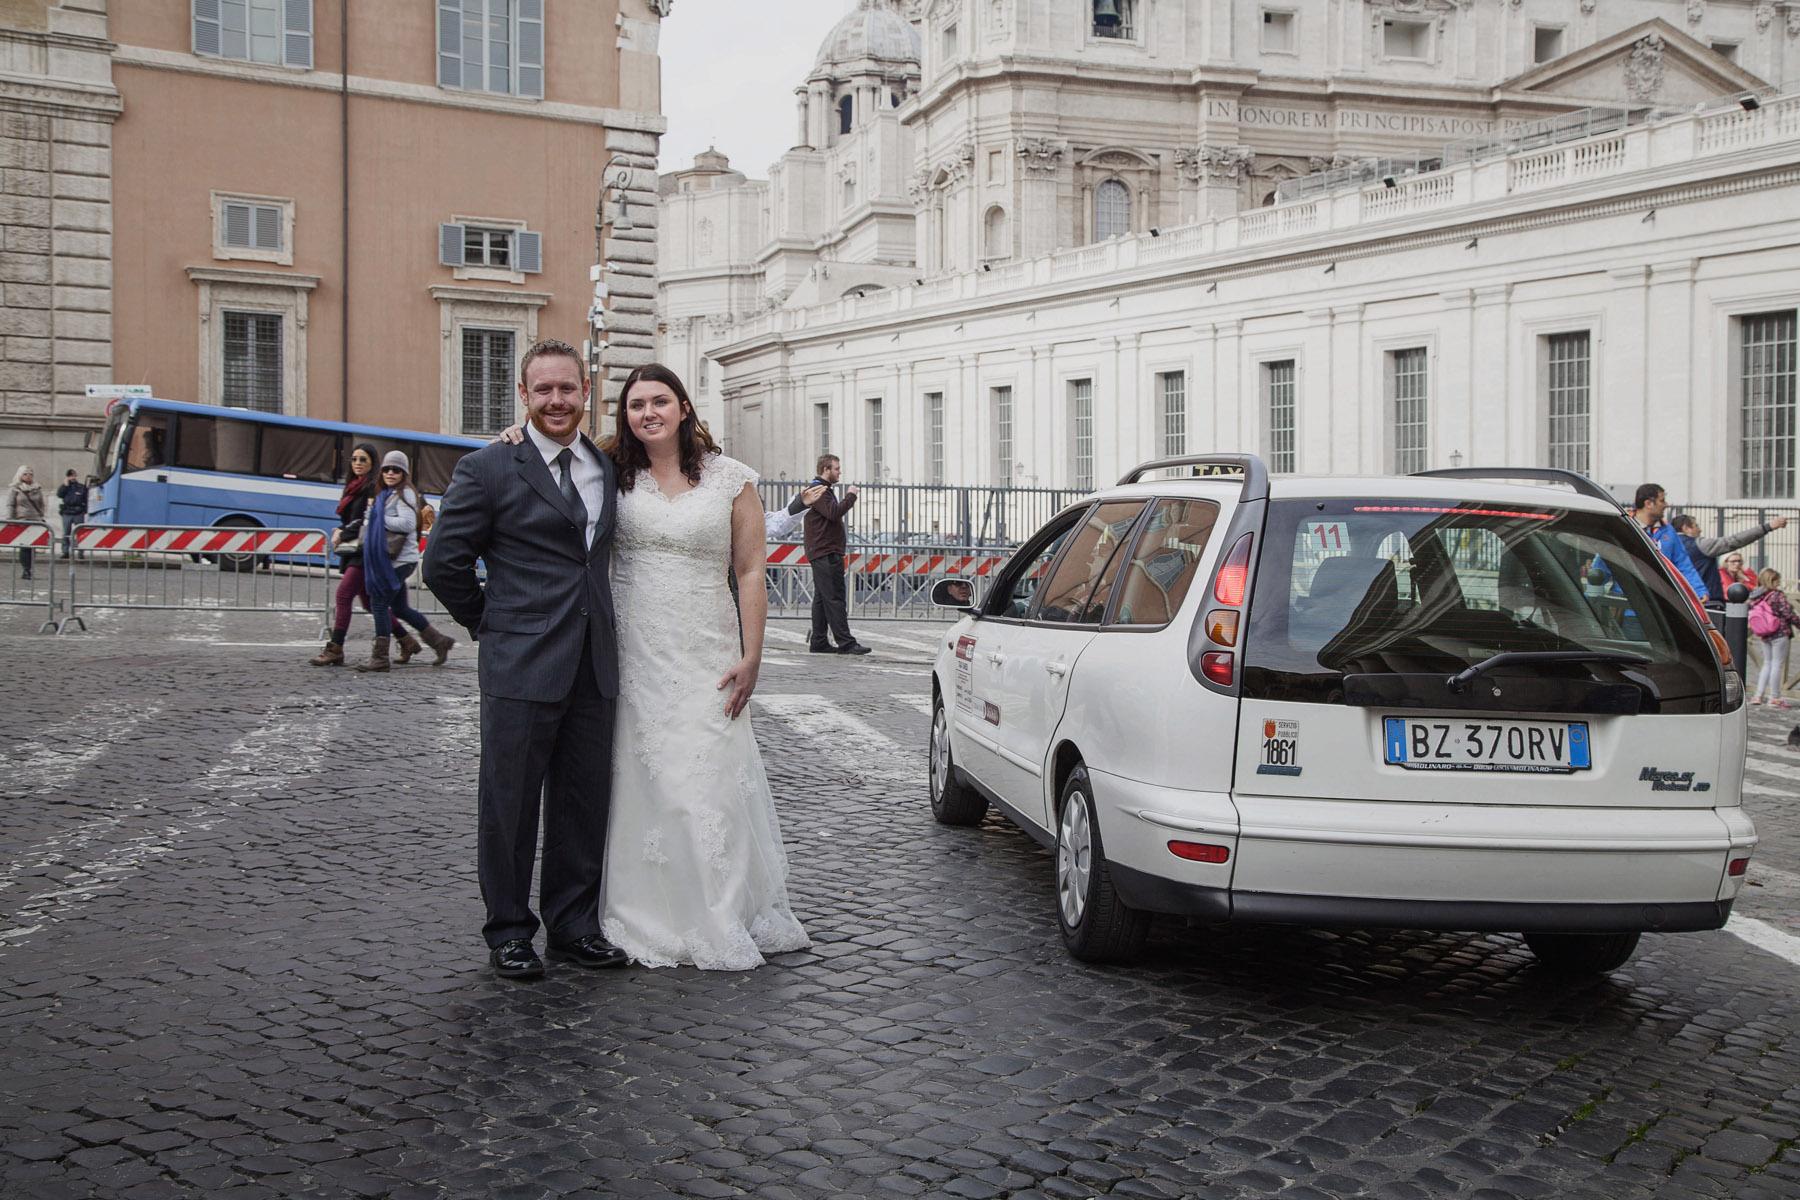 Chiara Spaghetti Kurtovic Popes Two 7